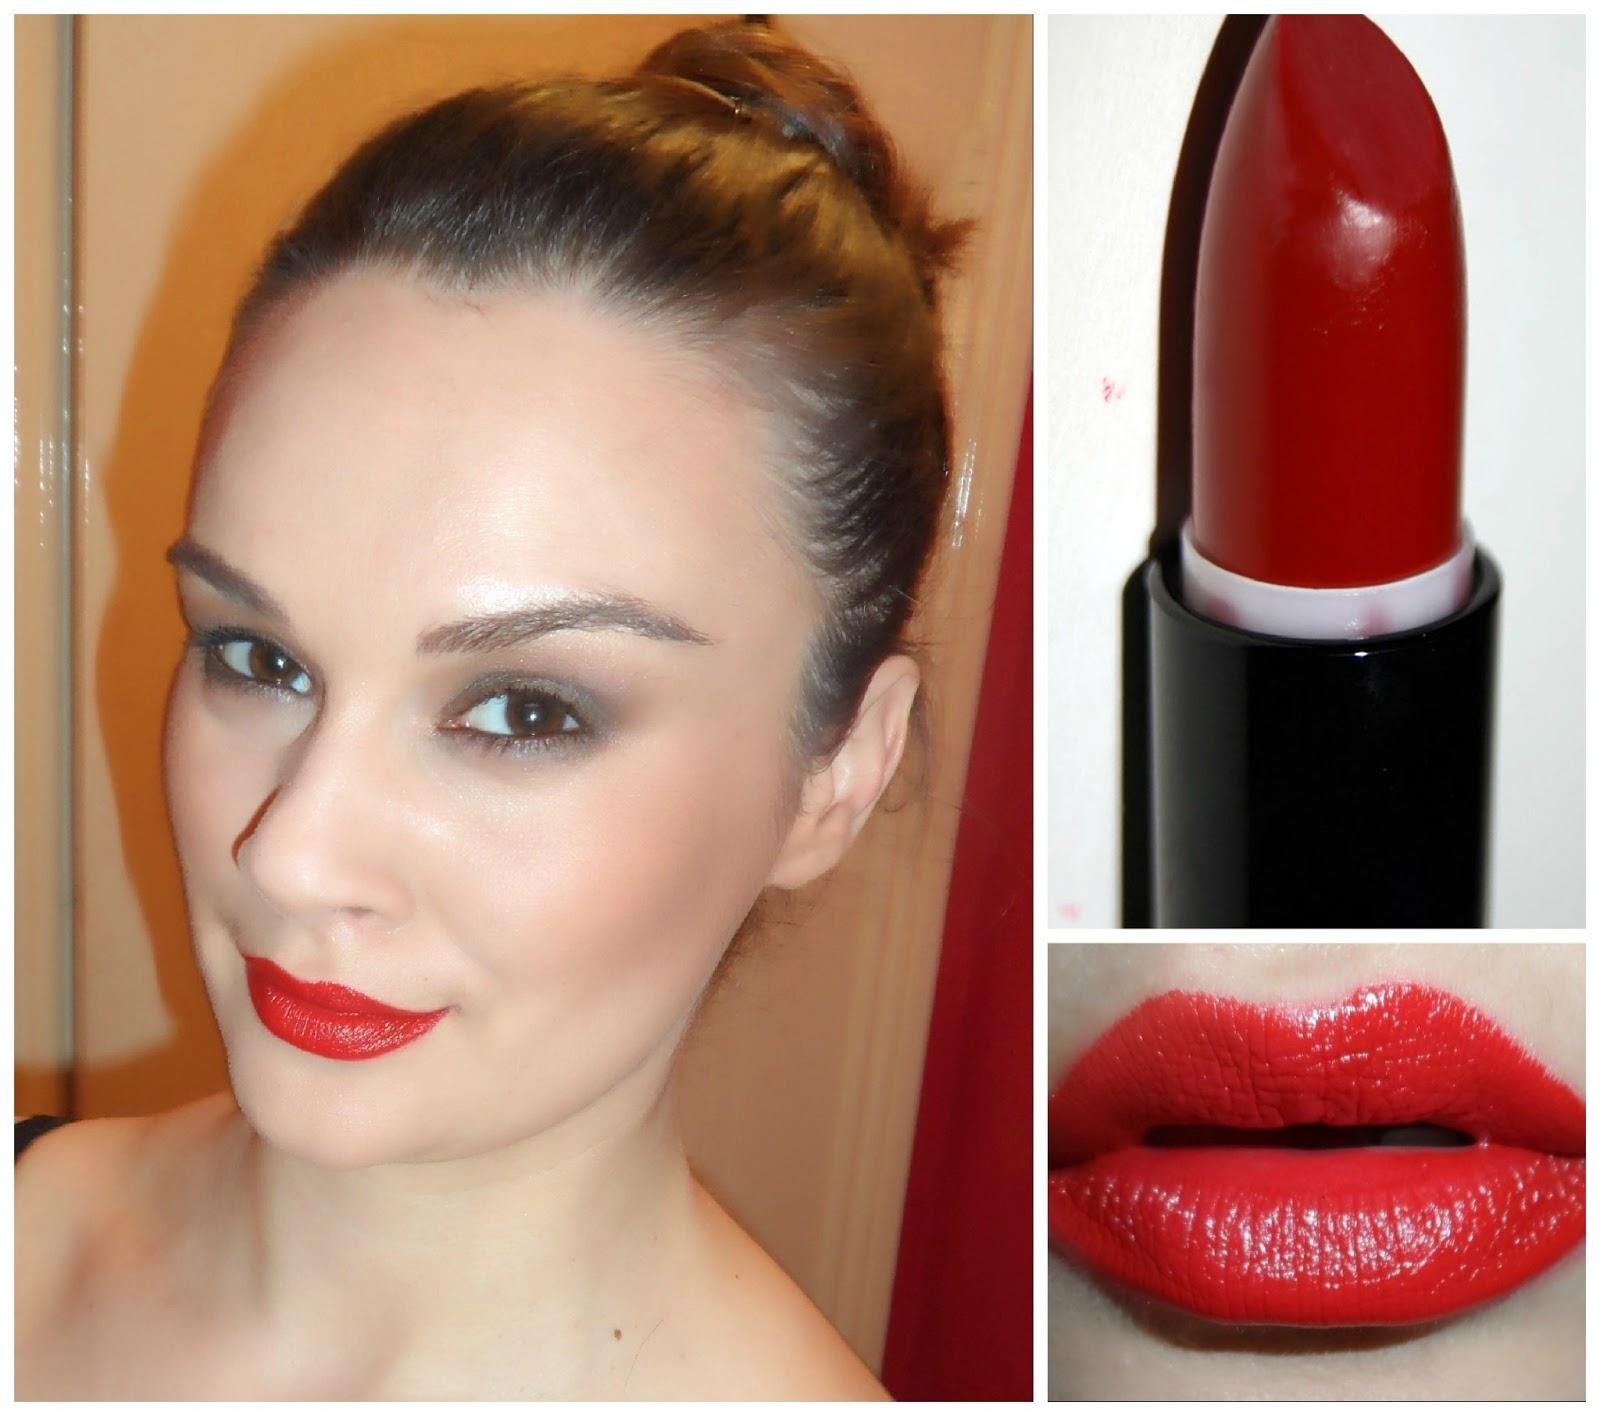 http://2.bp.blogspot.com/-r40lwBqP5Kc/UTkM1iu2I3I/AAAAAAAAFBI/HHqAGq6p4qI/s1600/rimmel+kate+moss+lipstick+shade+01.jpg